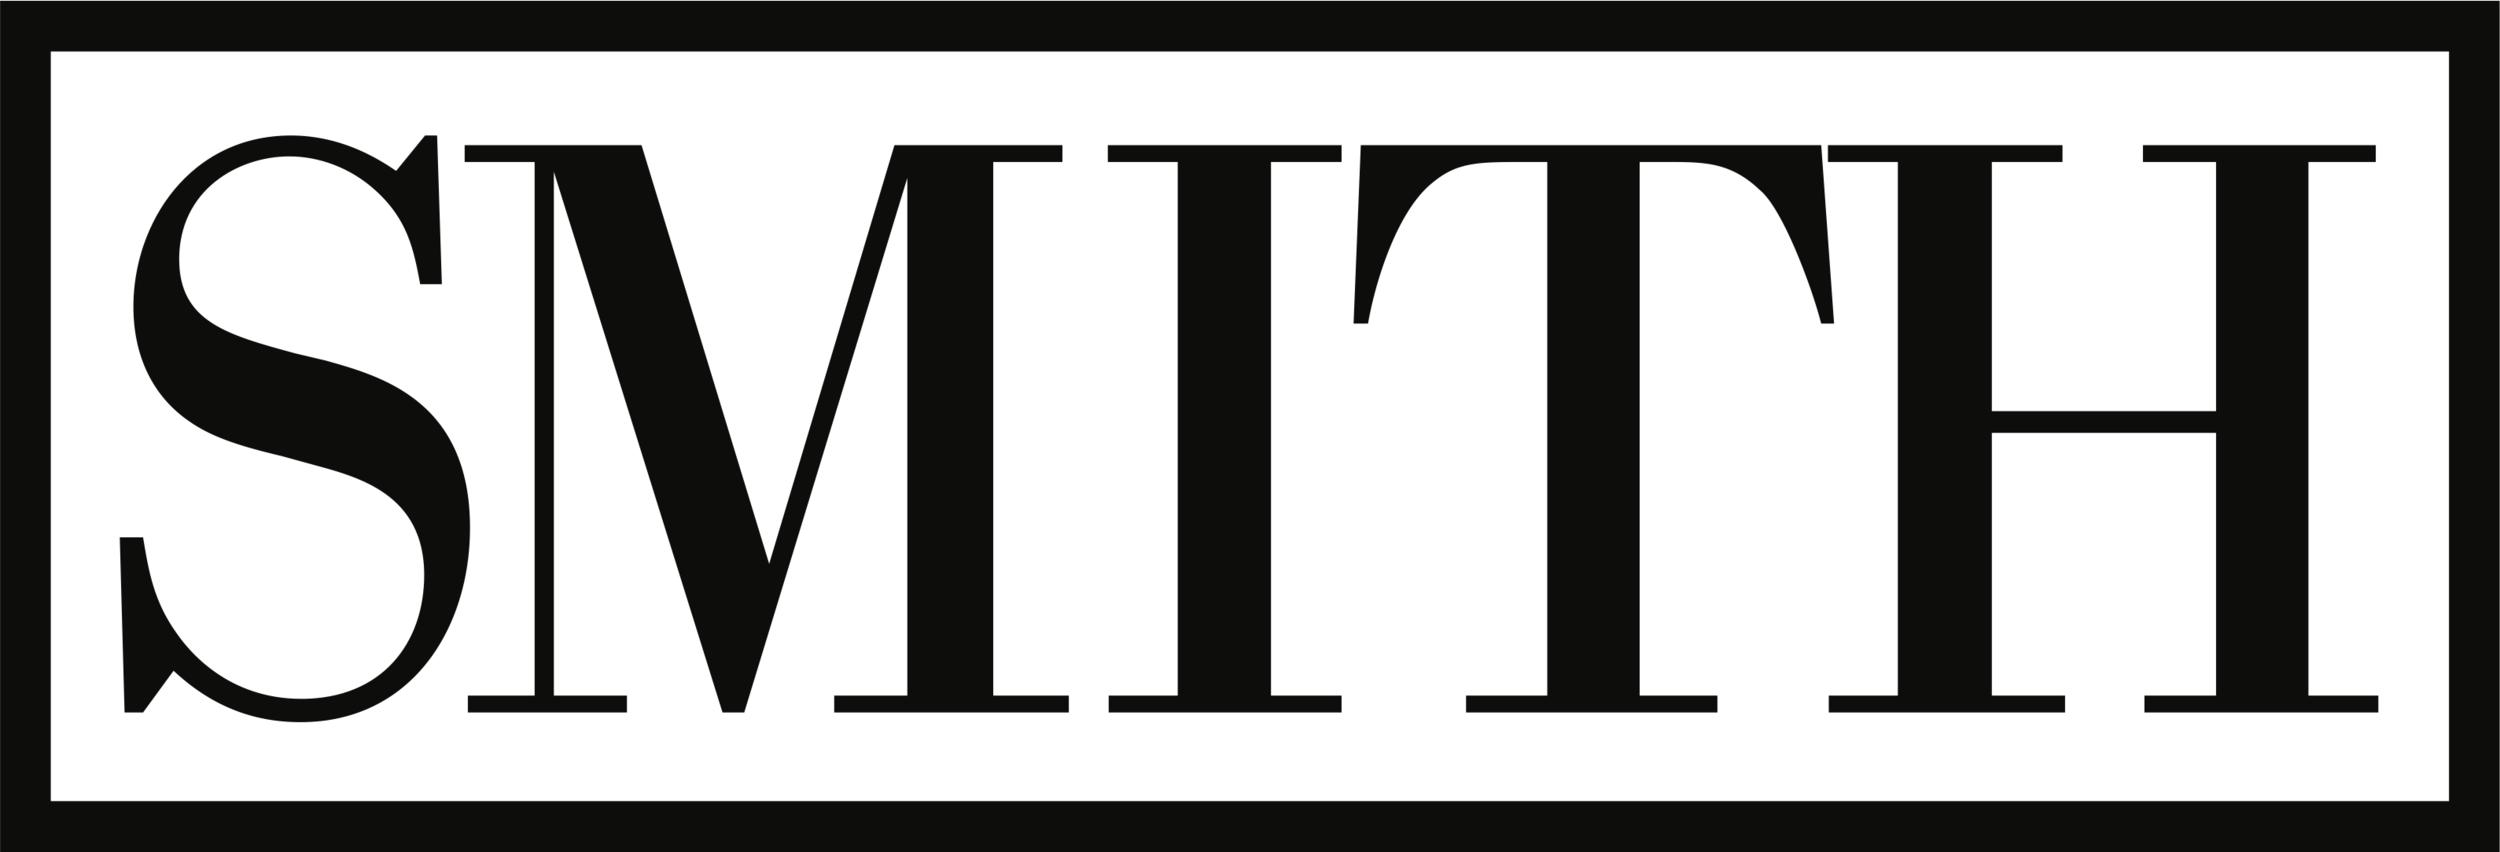 Smith Box Logo - Standard (Black).png